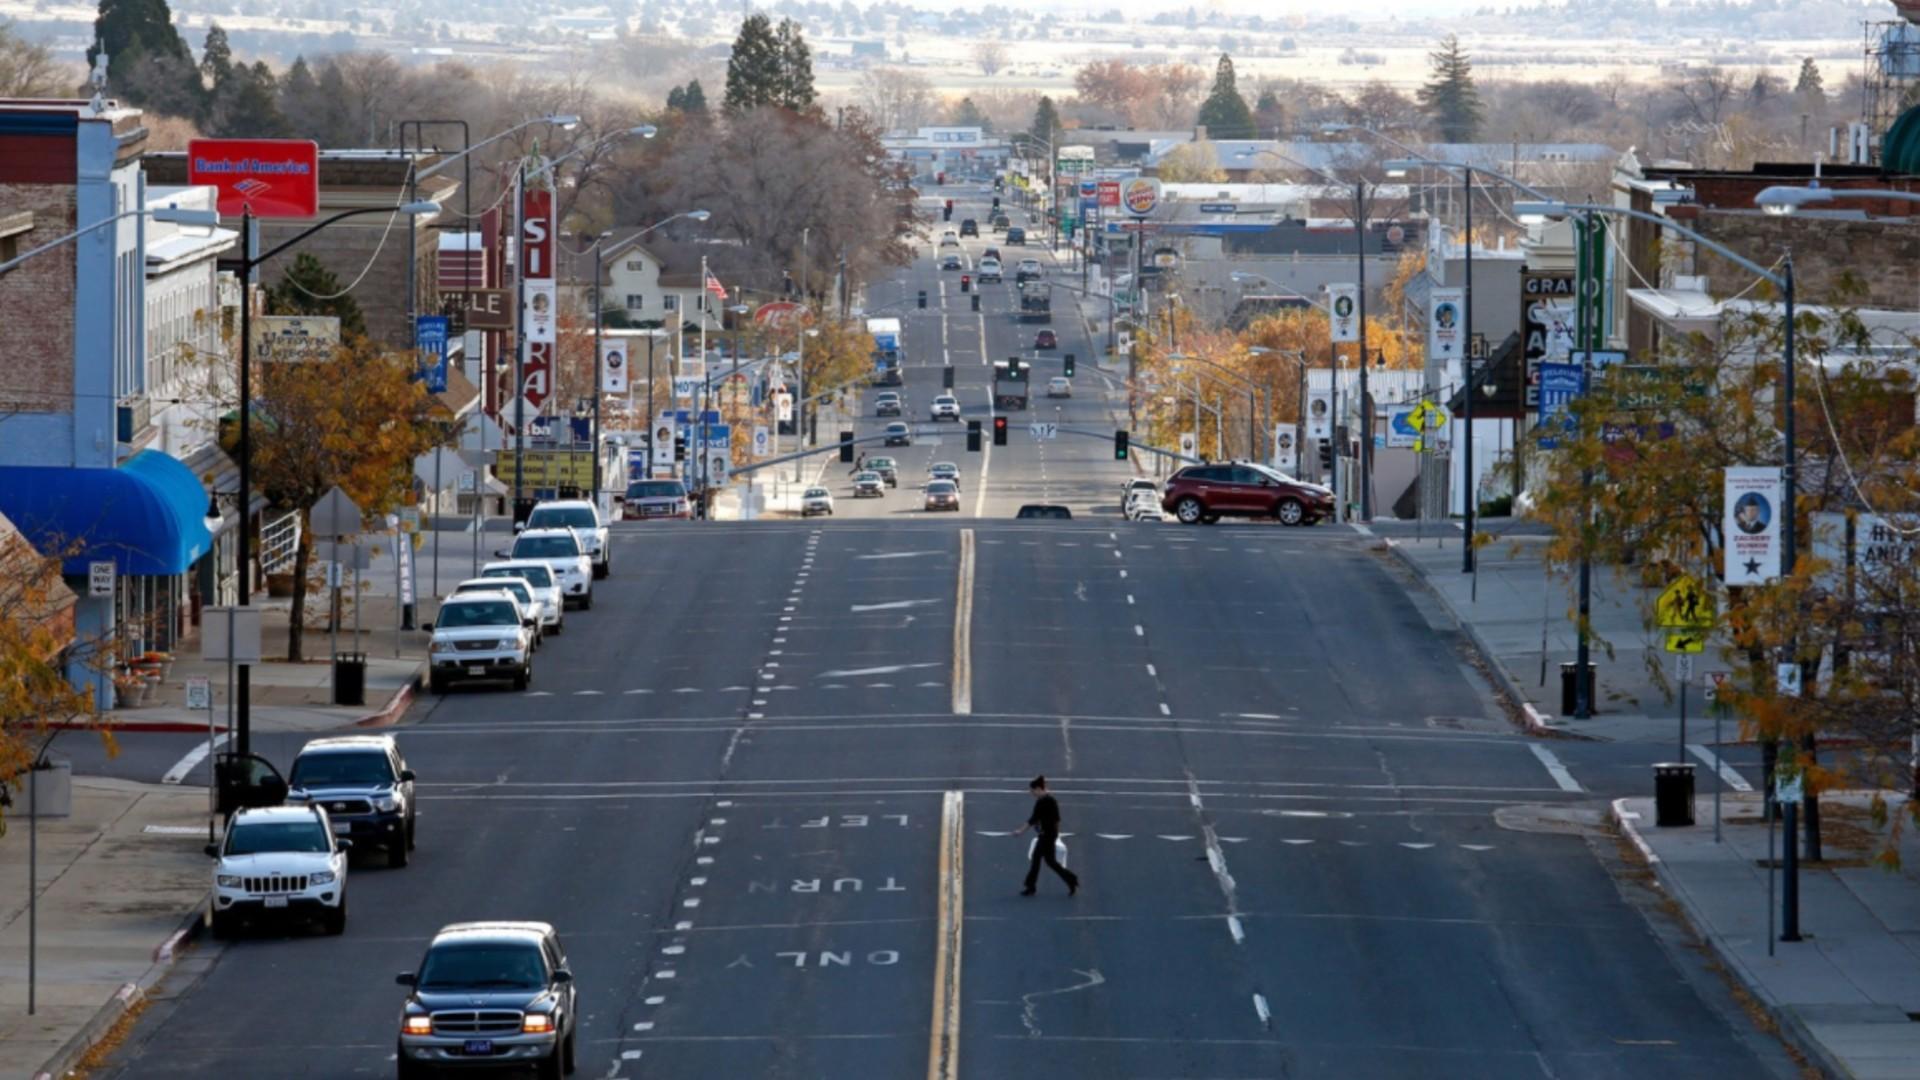 Main Street in Susanville, the seat of Lassen County, is seen in a file photo. (Gary Coronado / Los Angeles Times)